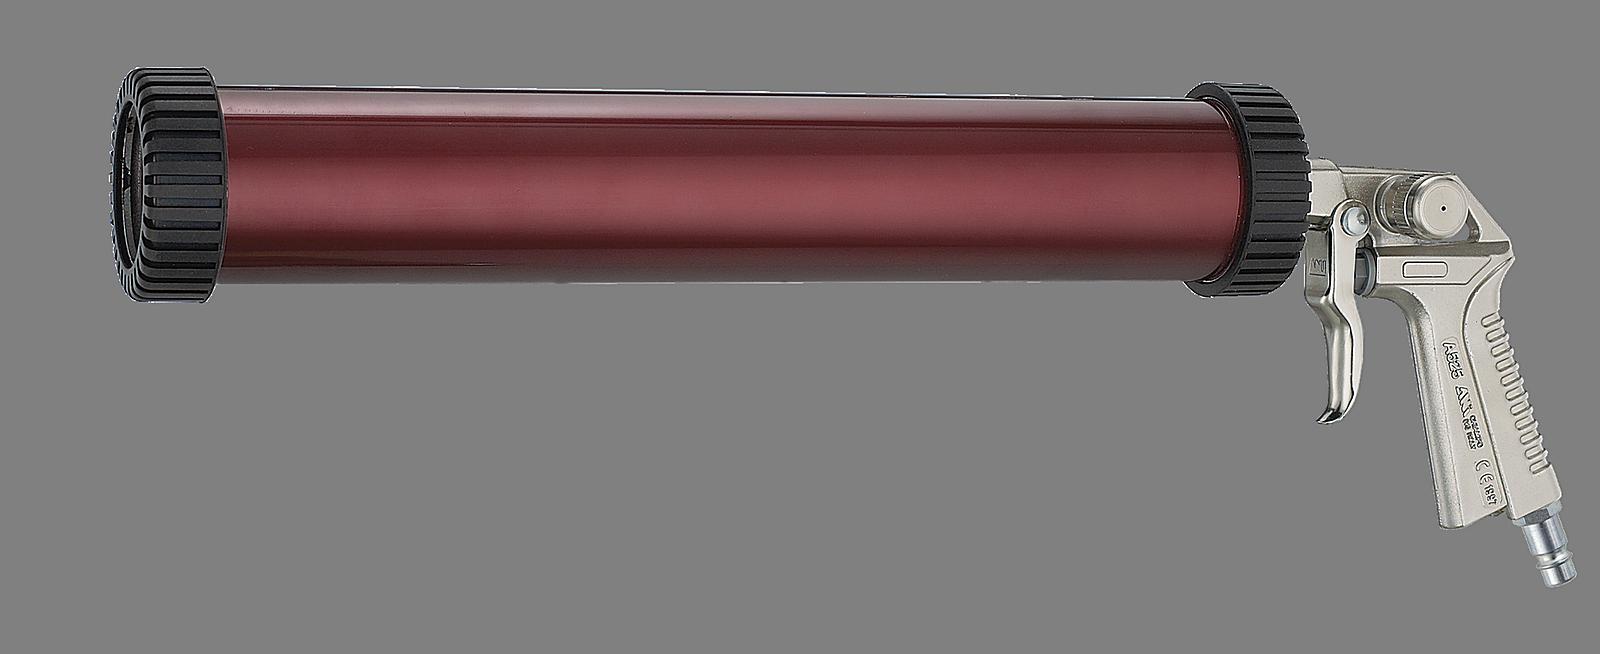 BAMAX 168PT pneu pistole na kartuše